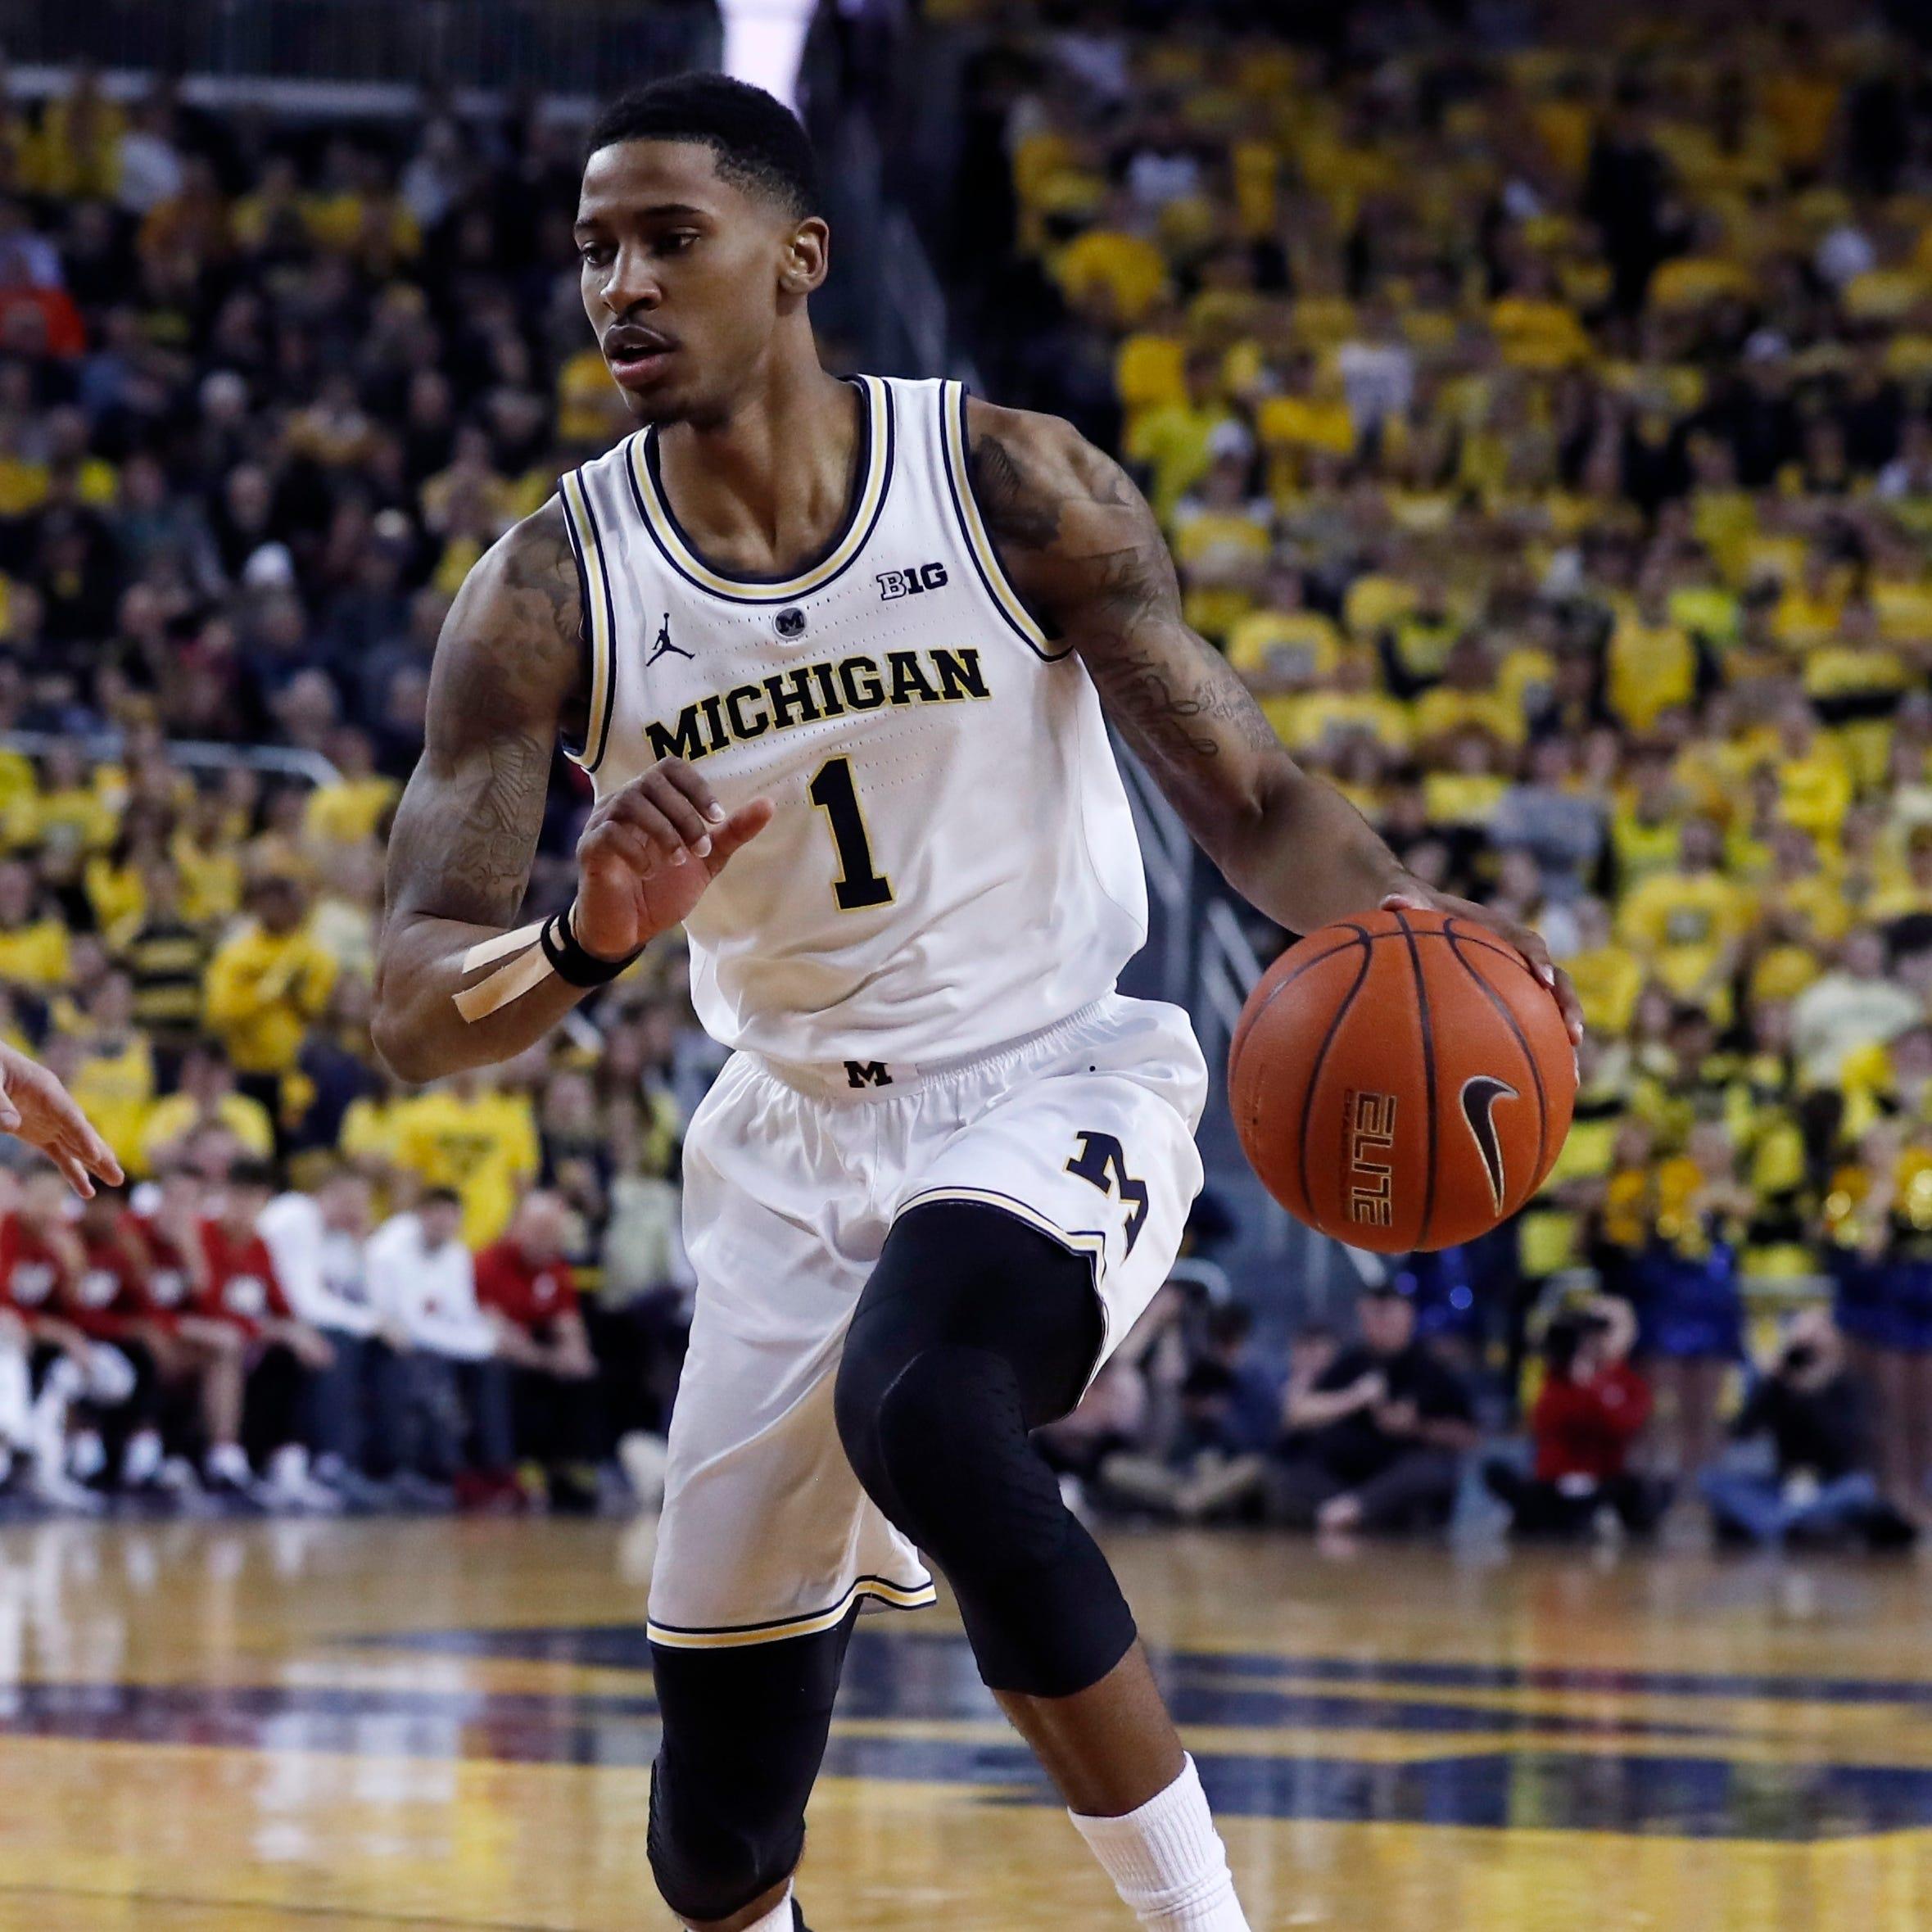 Michigan's Charles Matthews might return for showdown vs. Michigan State